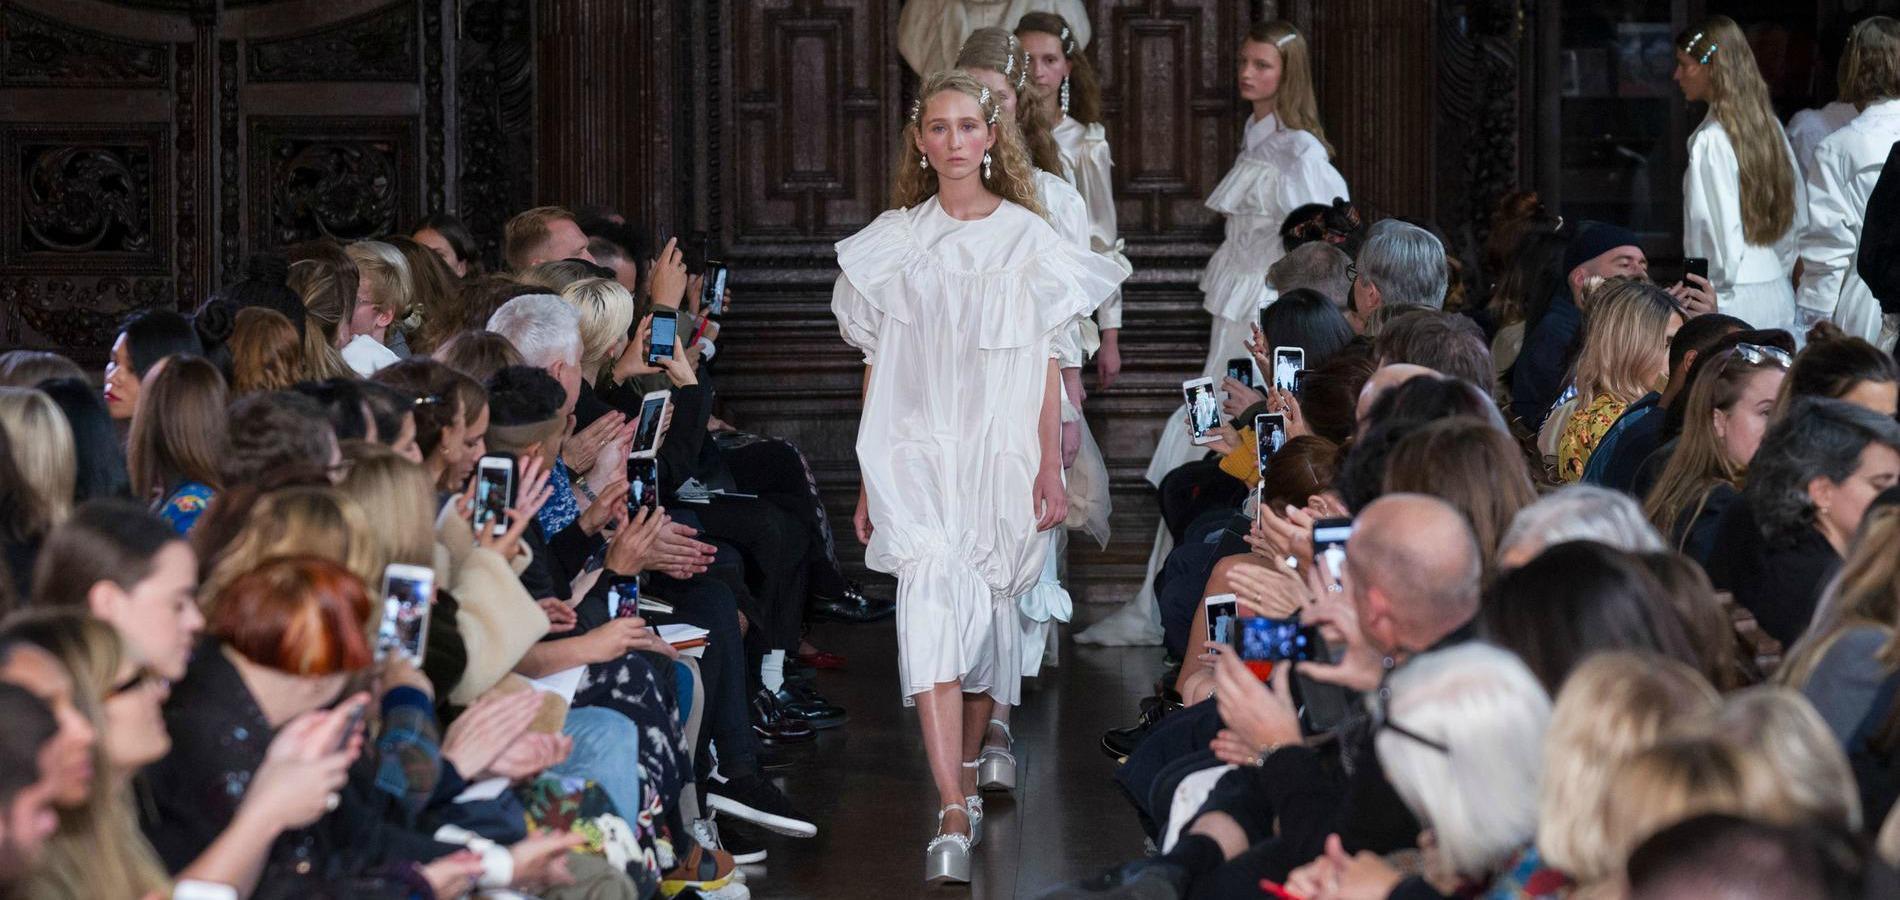 Défilé Simone Rocha printemps-été 2018 Prêt-à-porter - Madame Figaro 769f23beb82